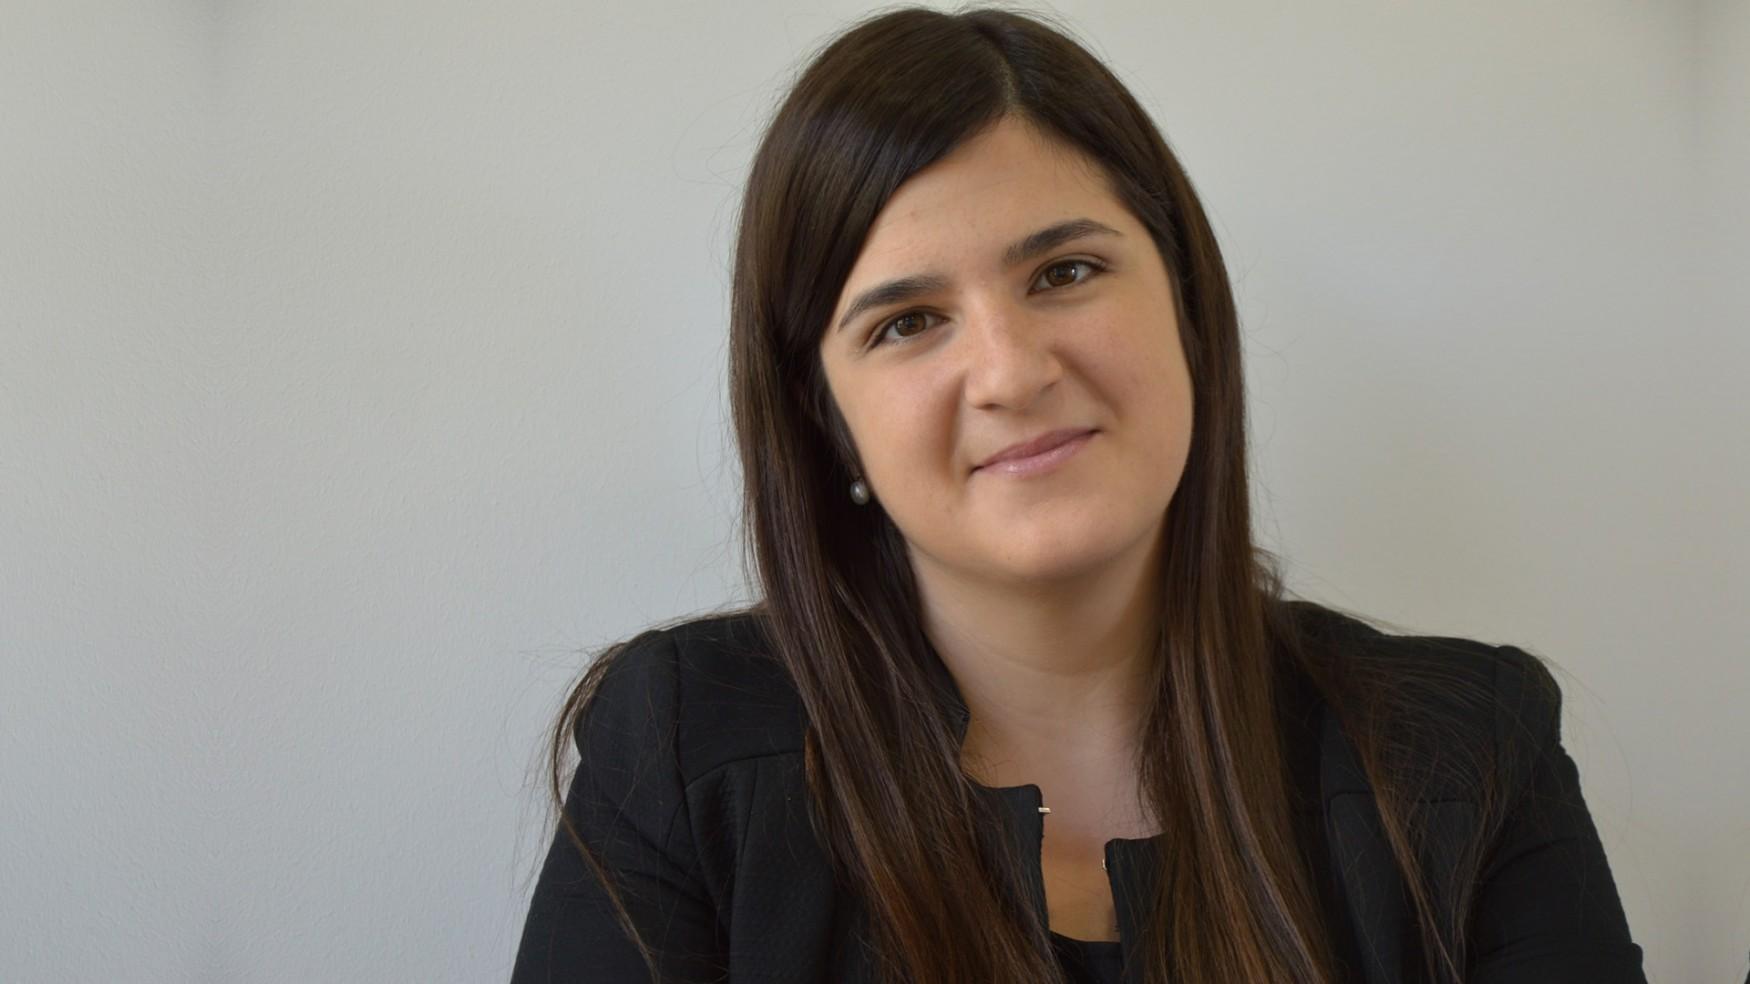 7 under 30 - Laura Gallardo